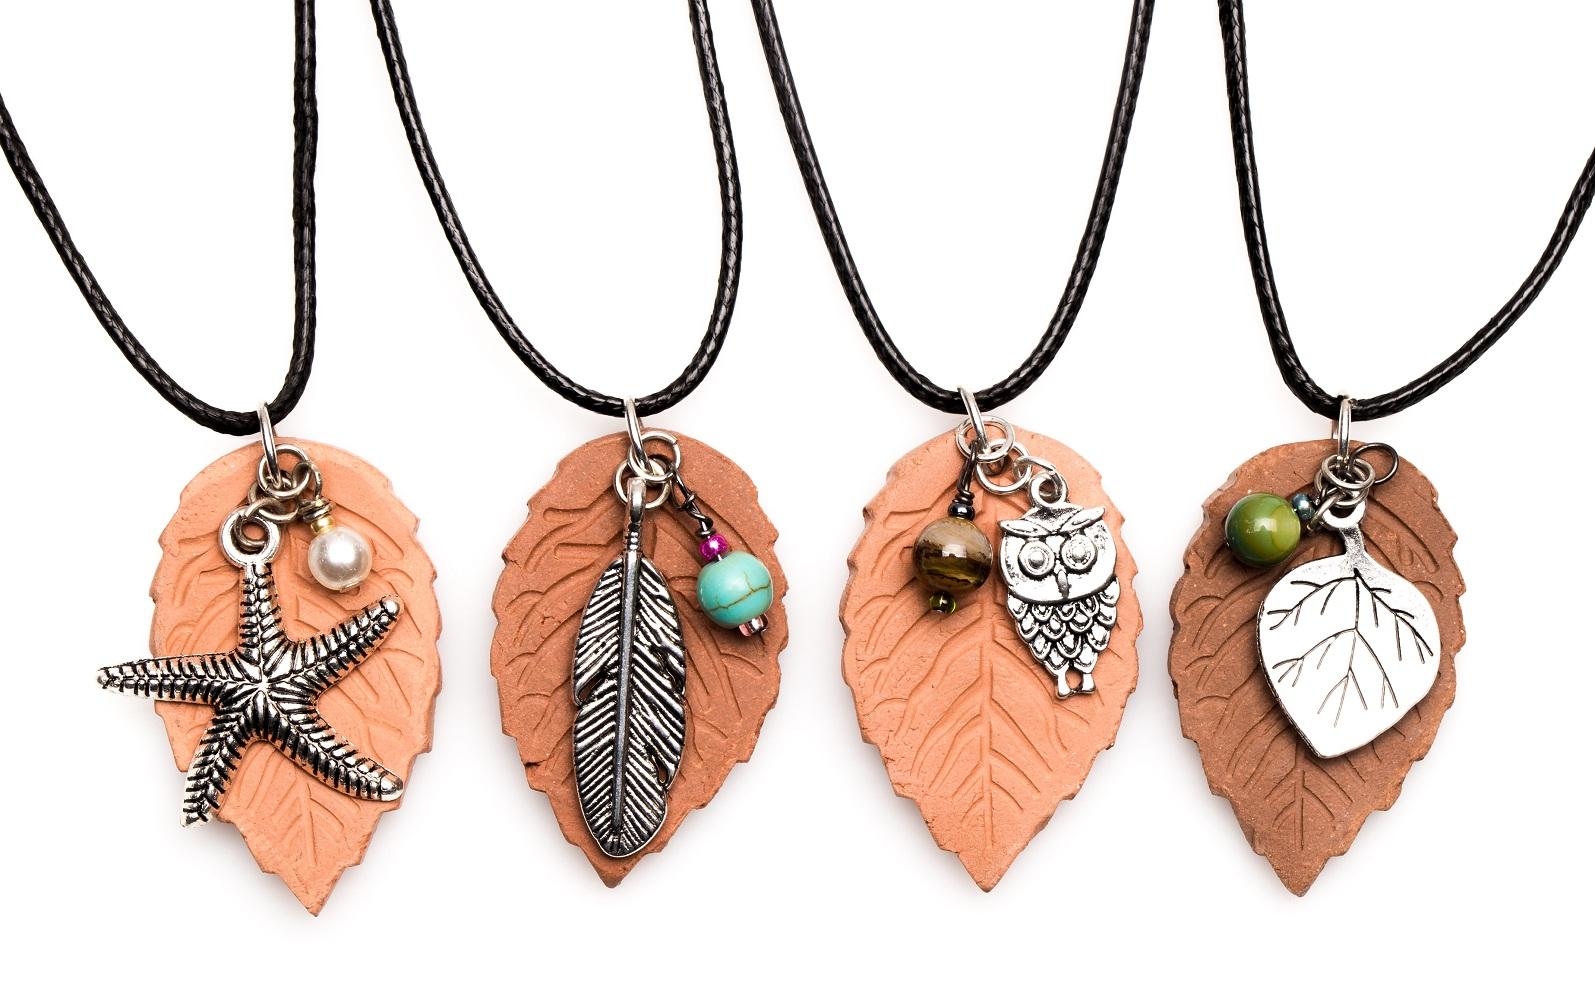 Terracotta Neck Pendant Diffuser ~ Terracotta pendant essential oil diffuser necklace bellechic